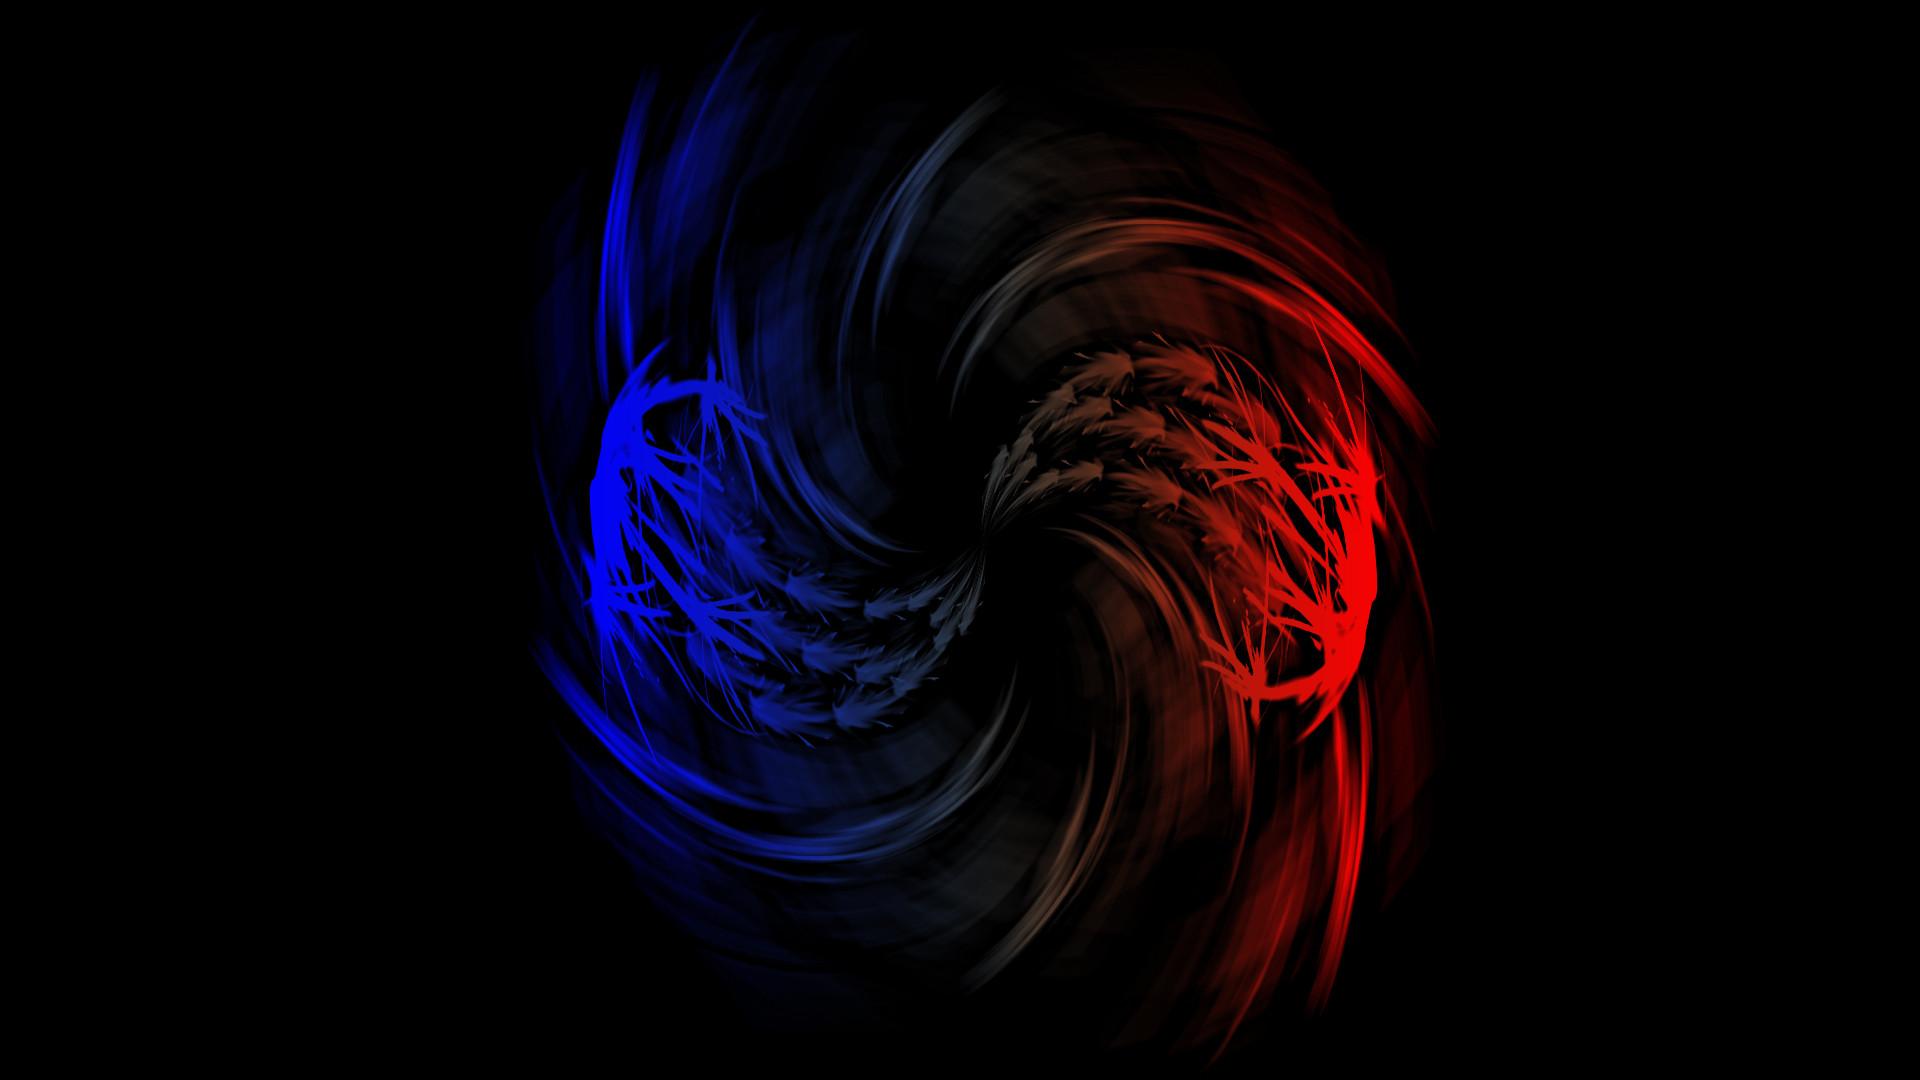 Abstract Yin Yang by MisterFurocity Abstract Yin Yang by MisterFurocity